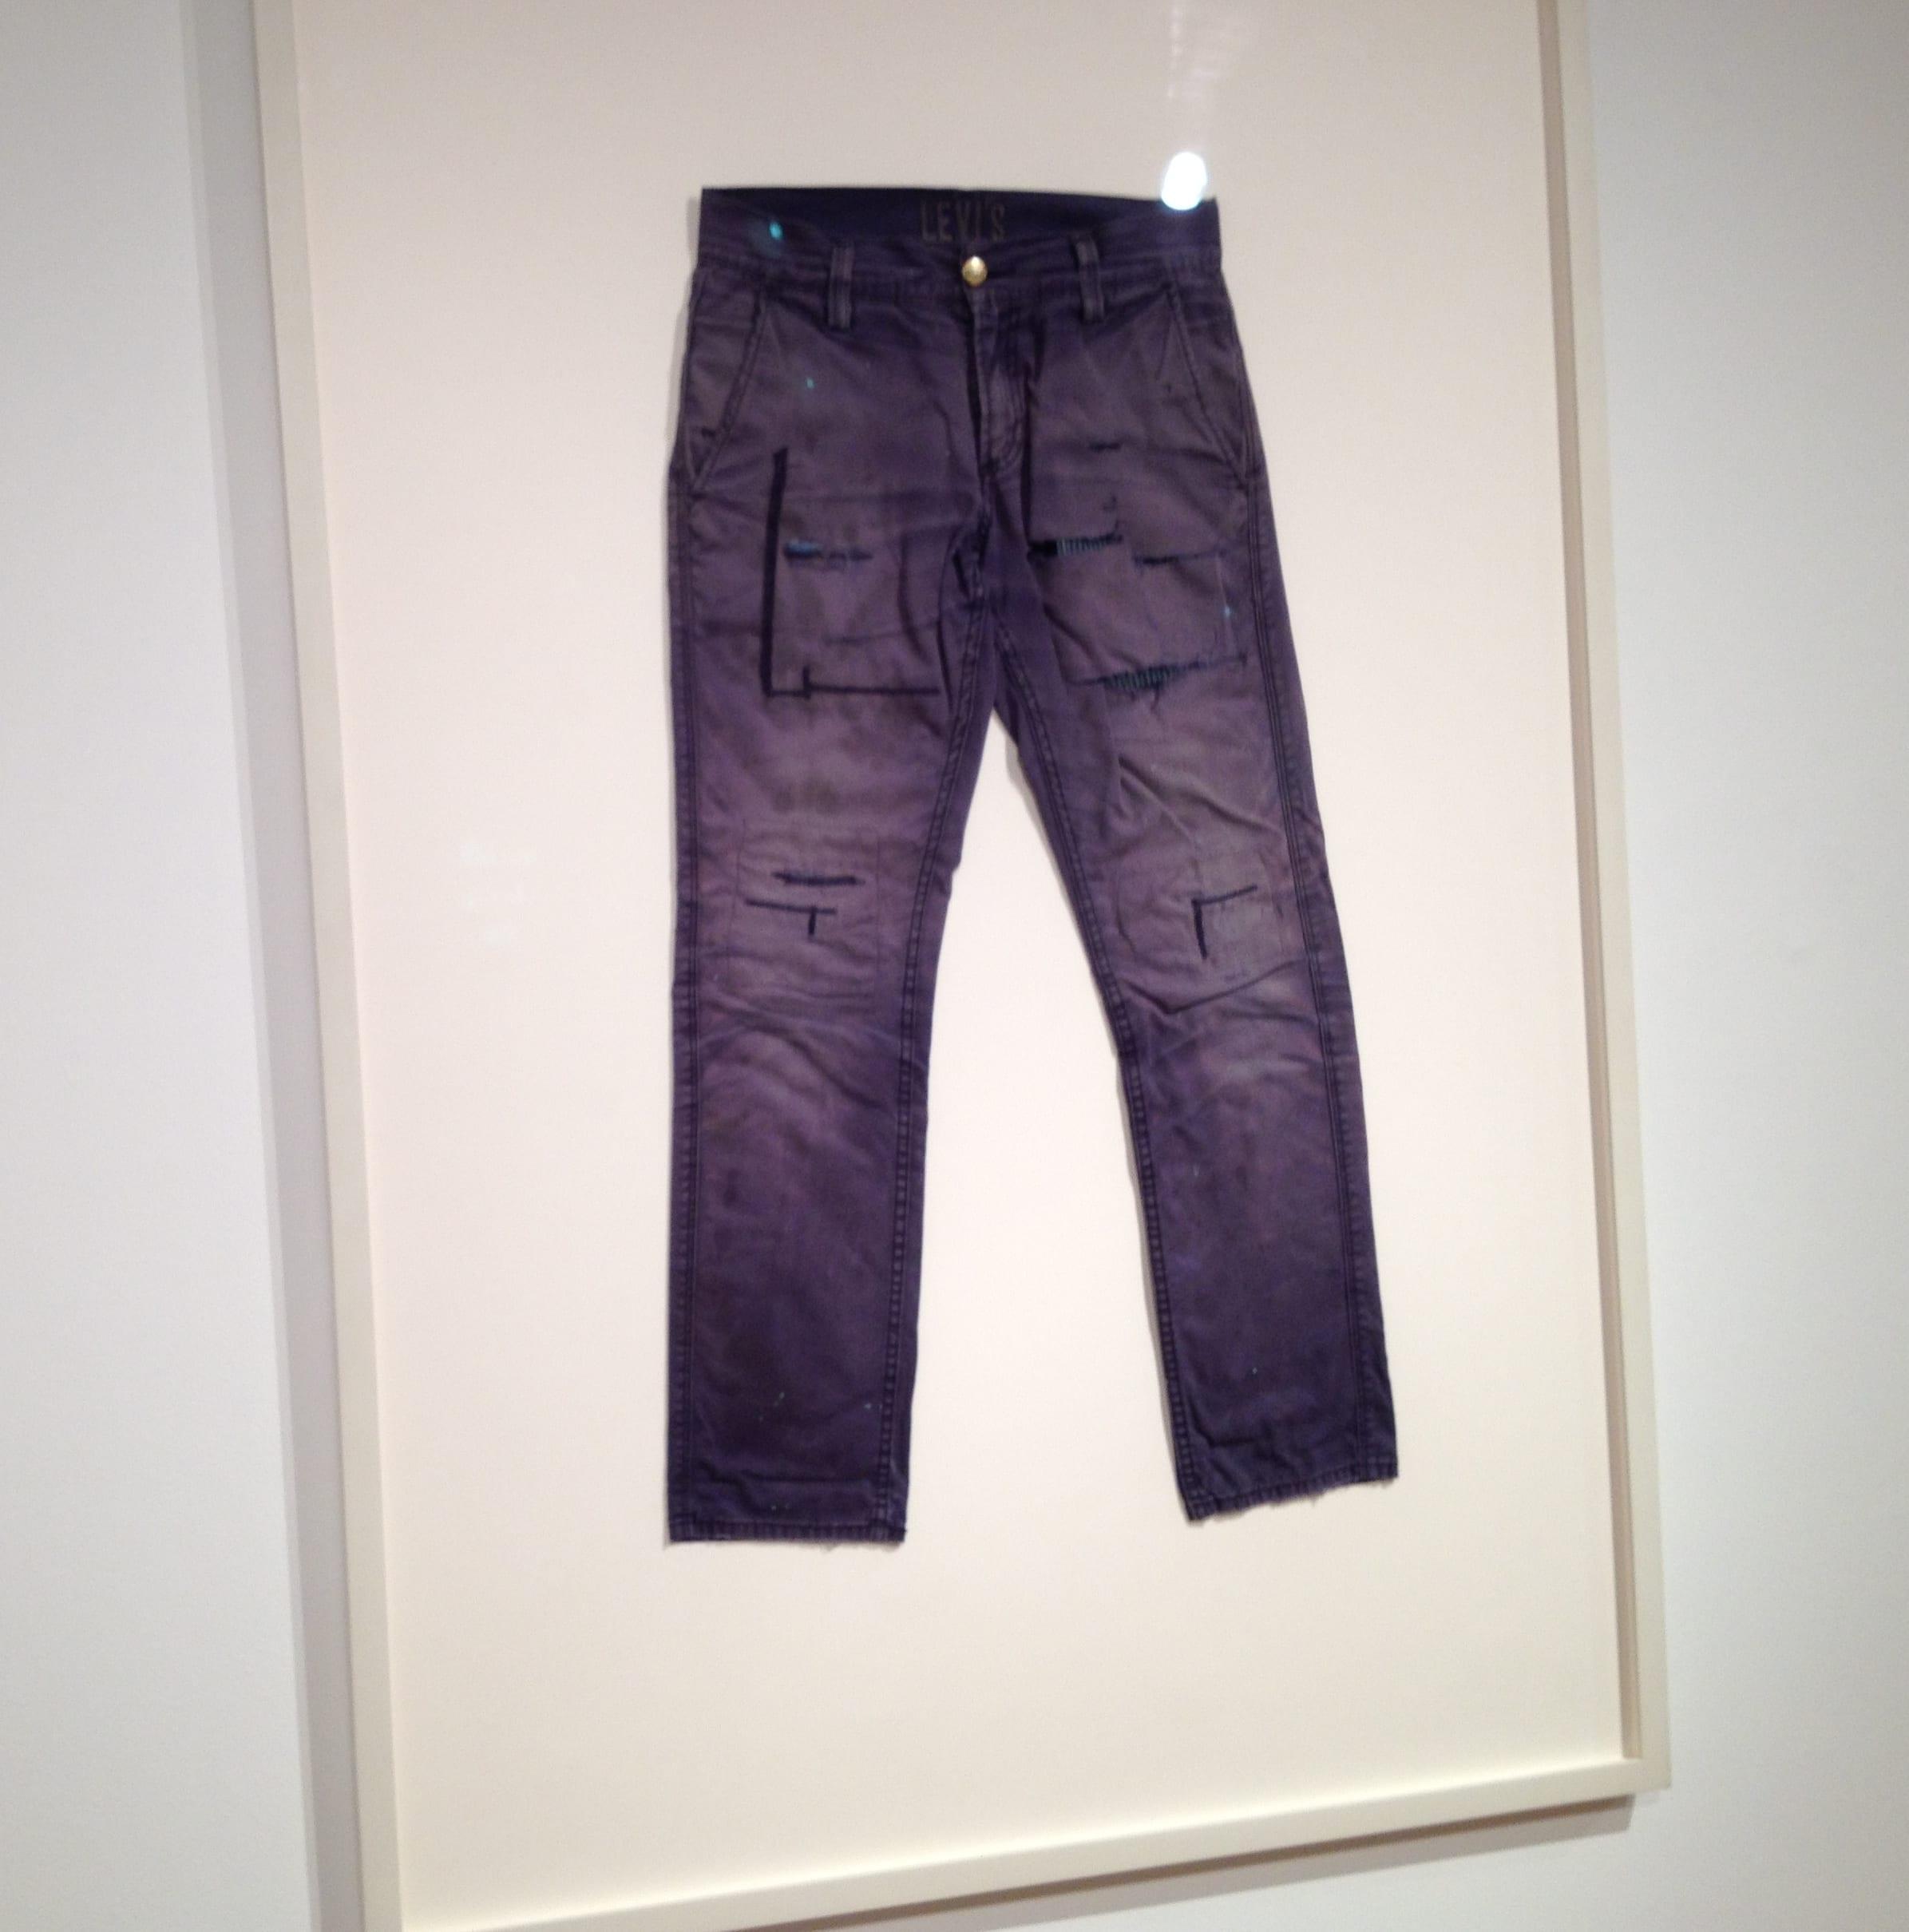 Visiting Professor Travis LaMothe's Hard Rock Cafe, 2015. Pants, frame, 57 x 40 inches.